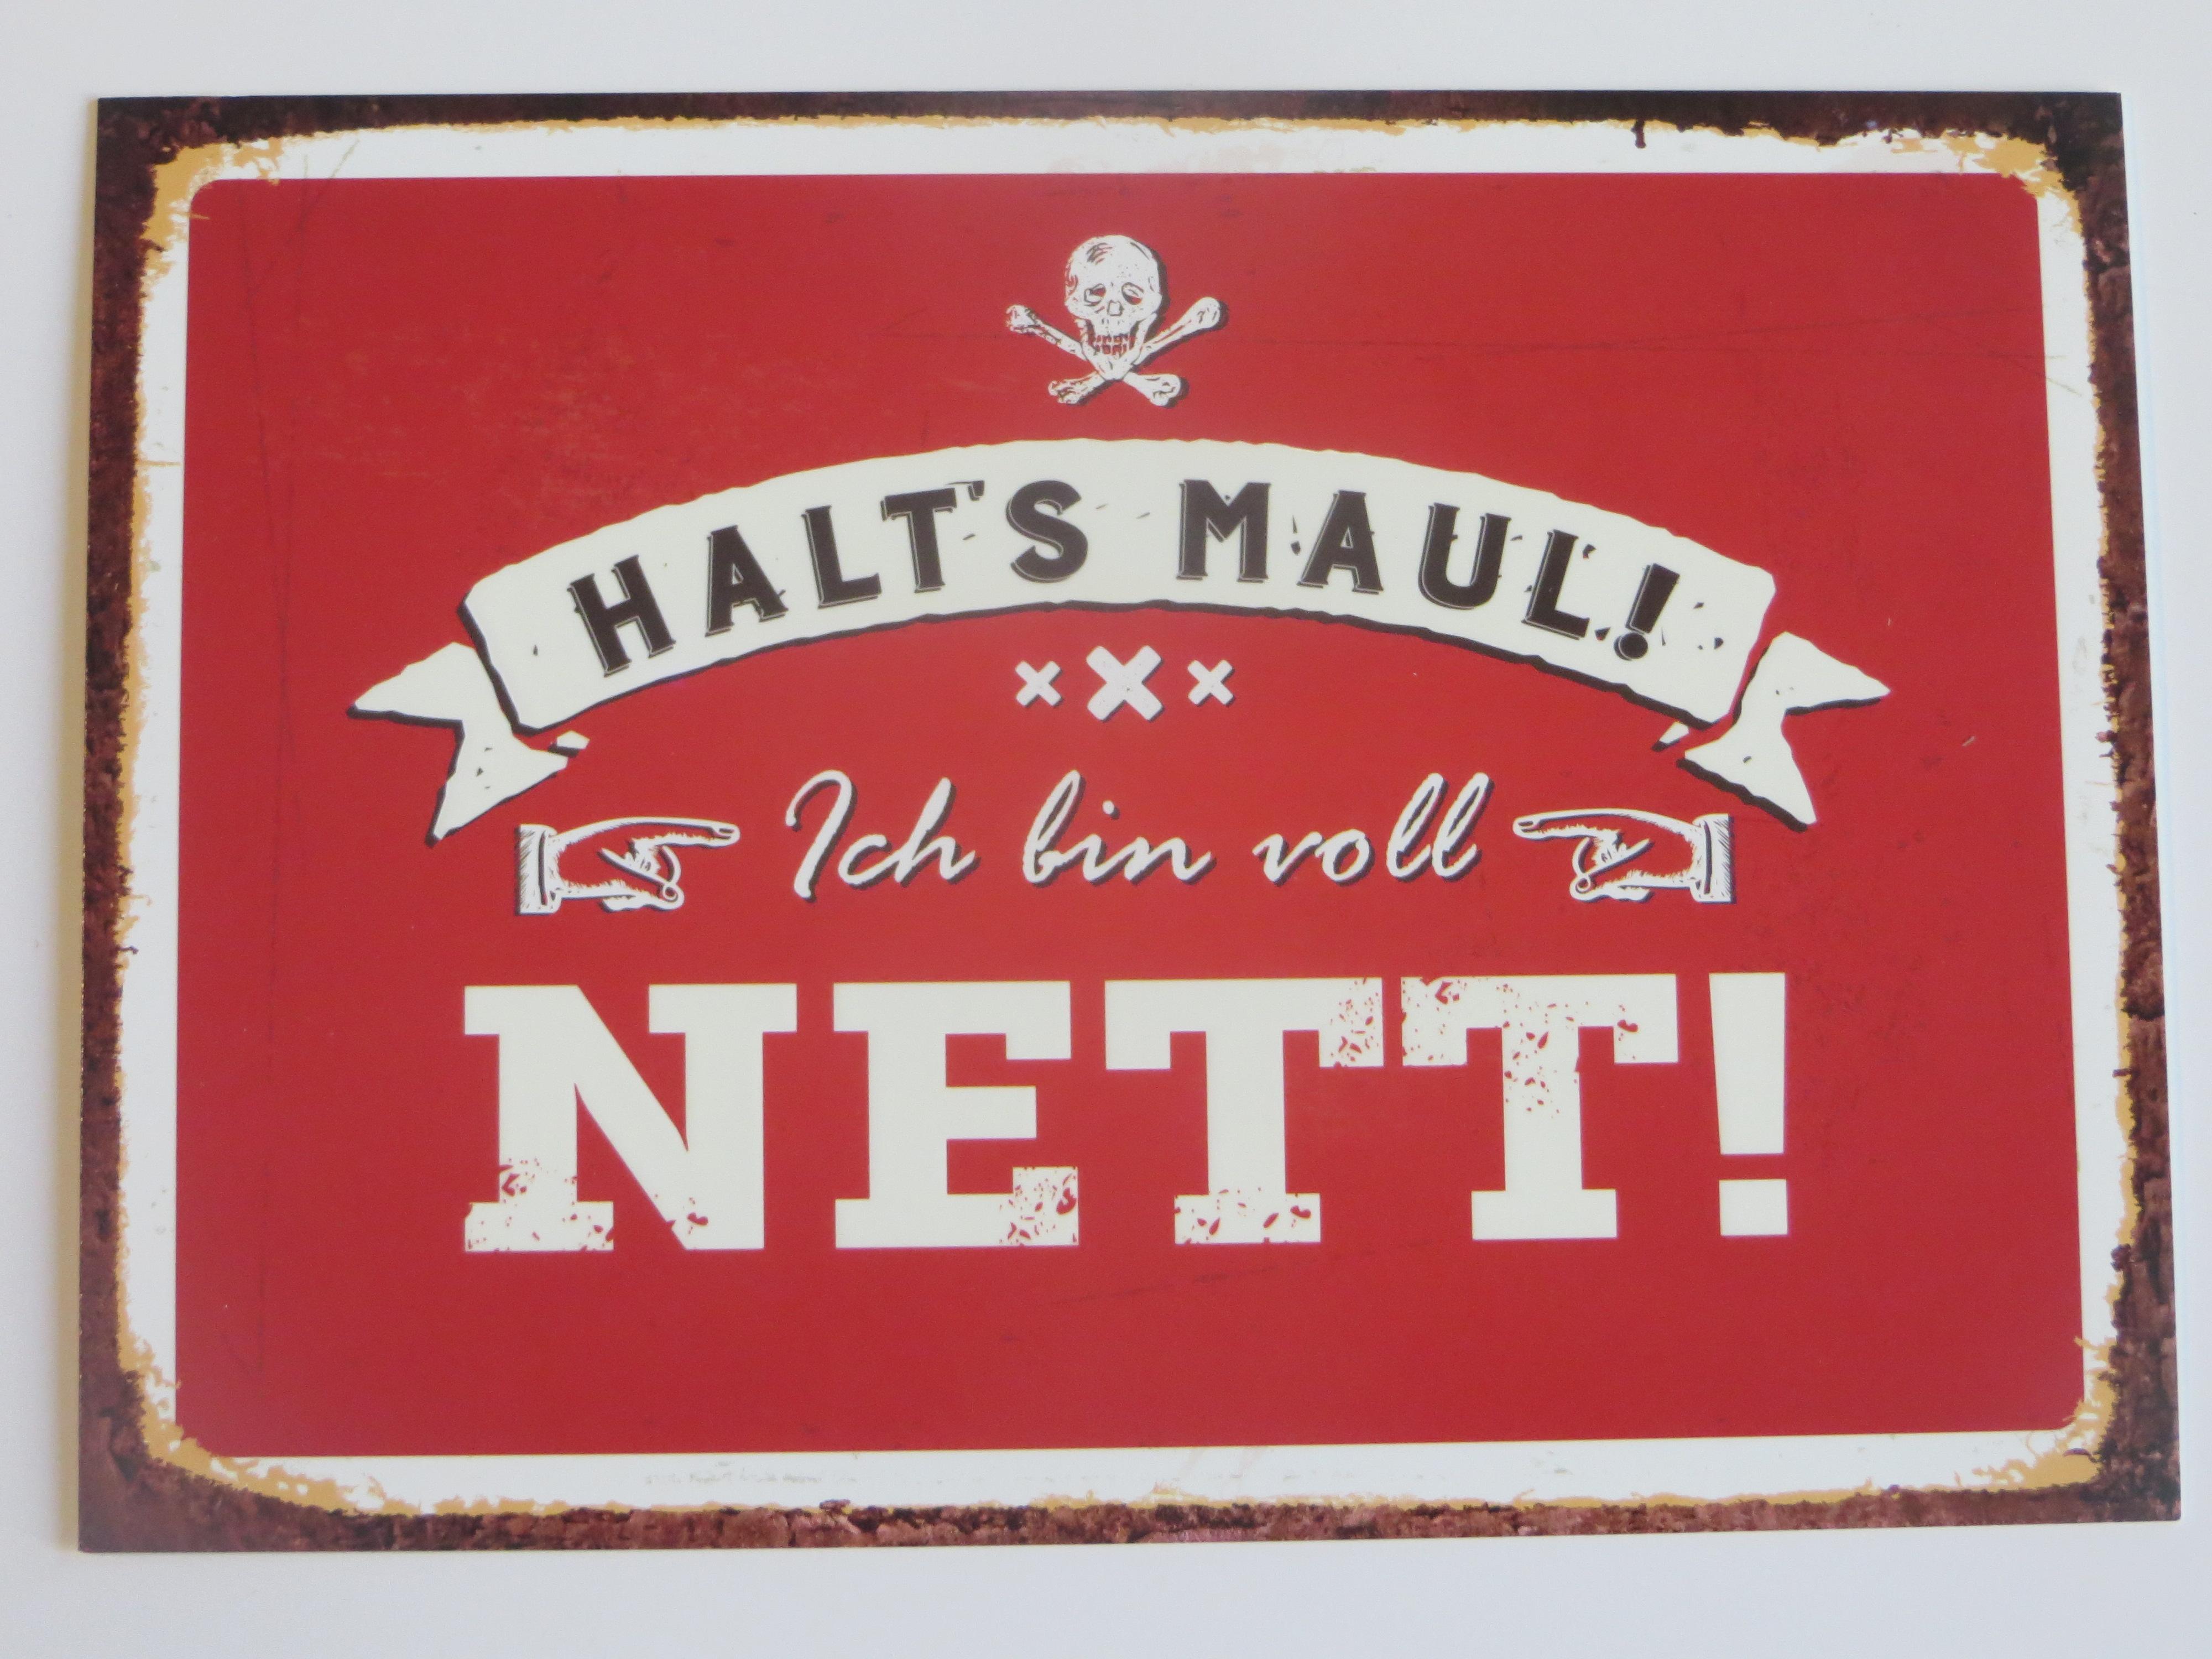 Postkarte Halts Maul Ich bin voll nett